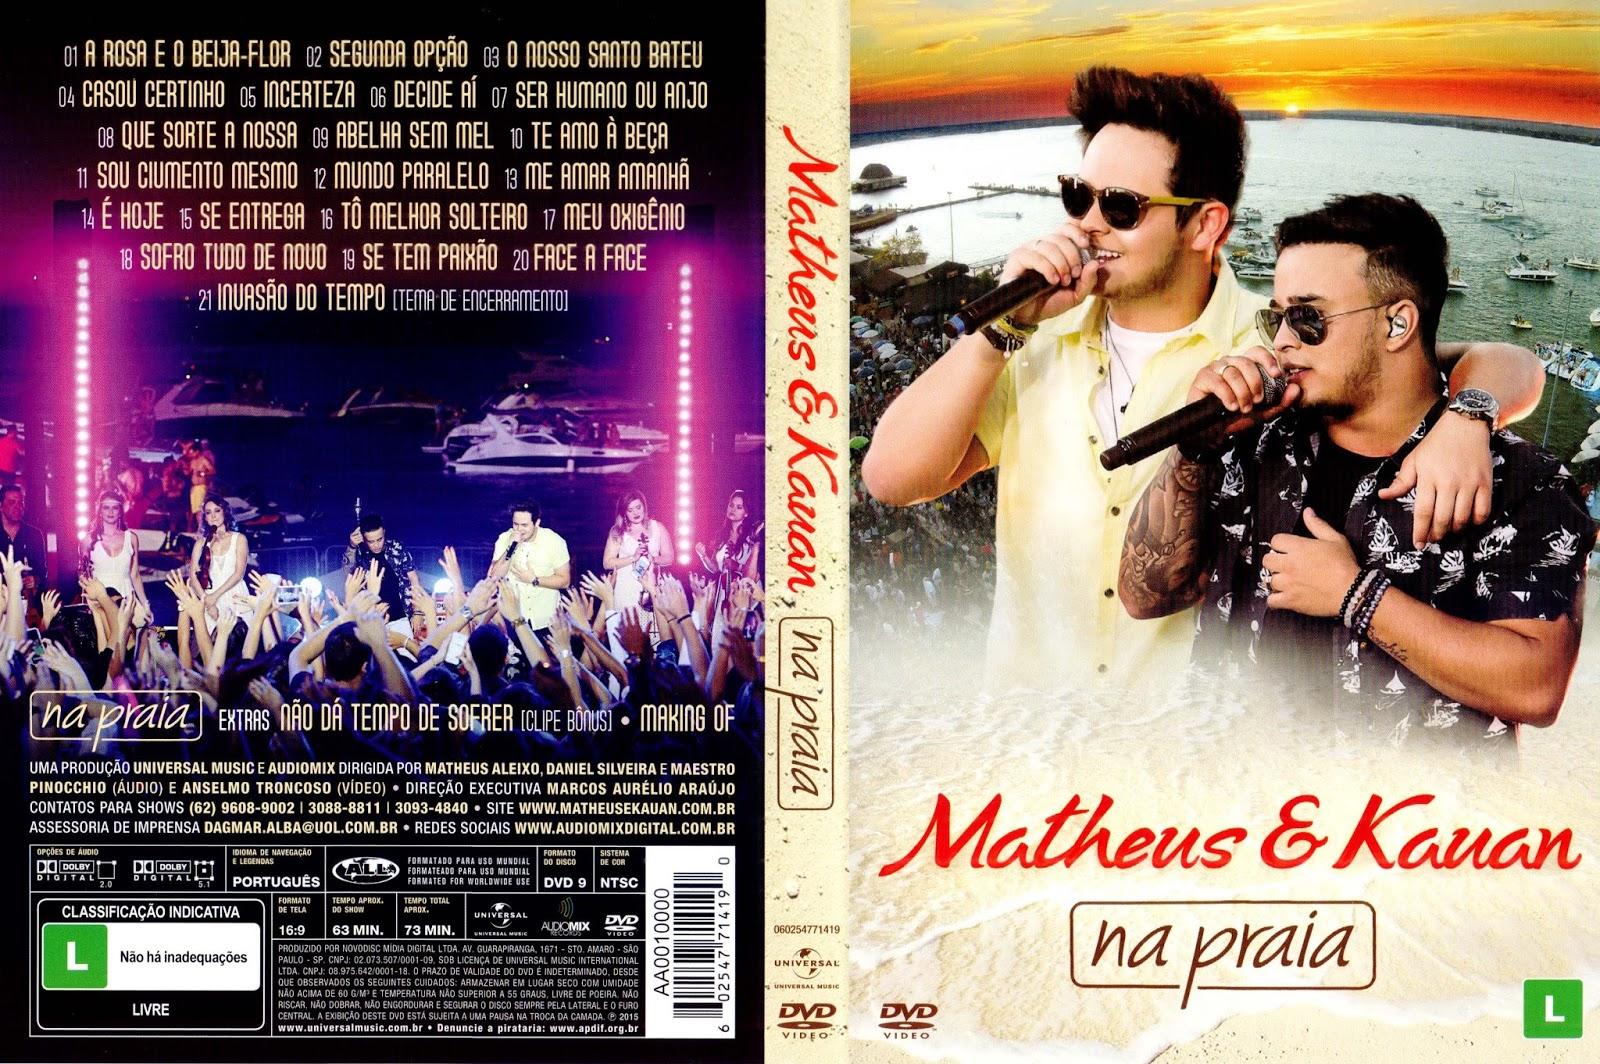 Matheus & Kauan Na Praia DVD-R Matheus 2B 2526 2BKauan 2BNa 2BPraia 2BDVD R 2B  2BXANDAODOWNLOAD